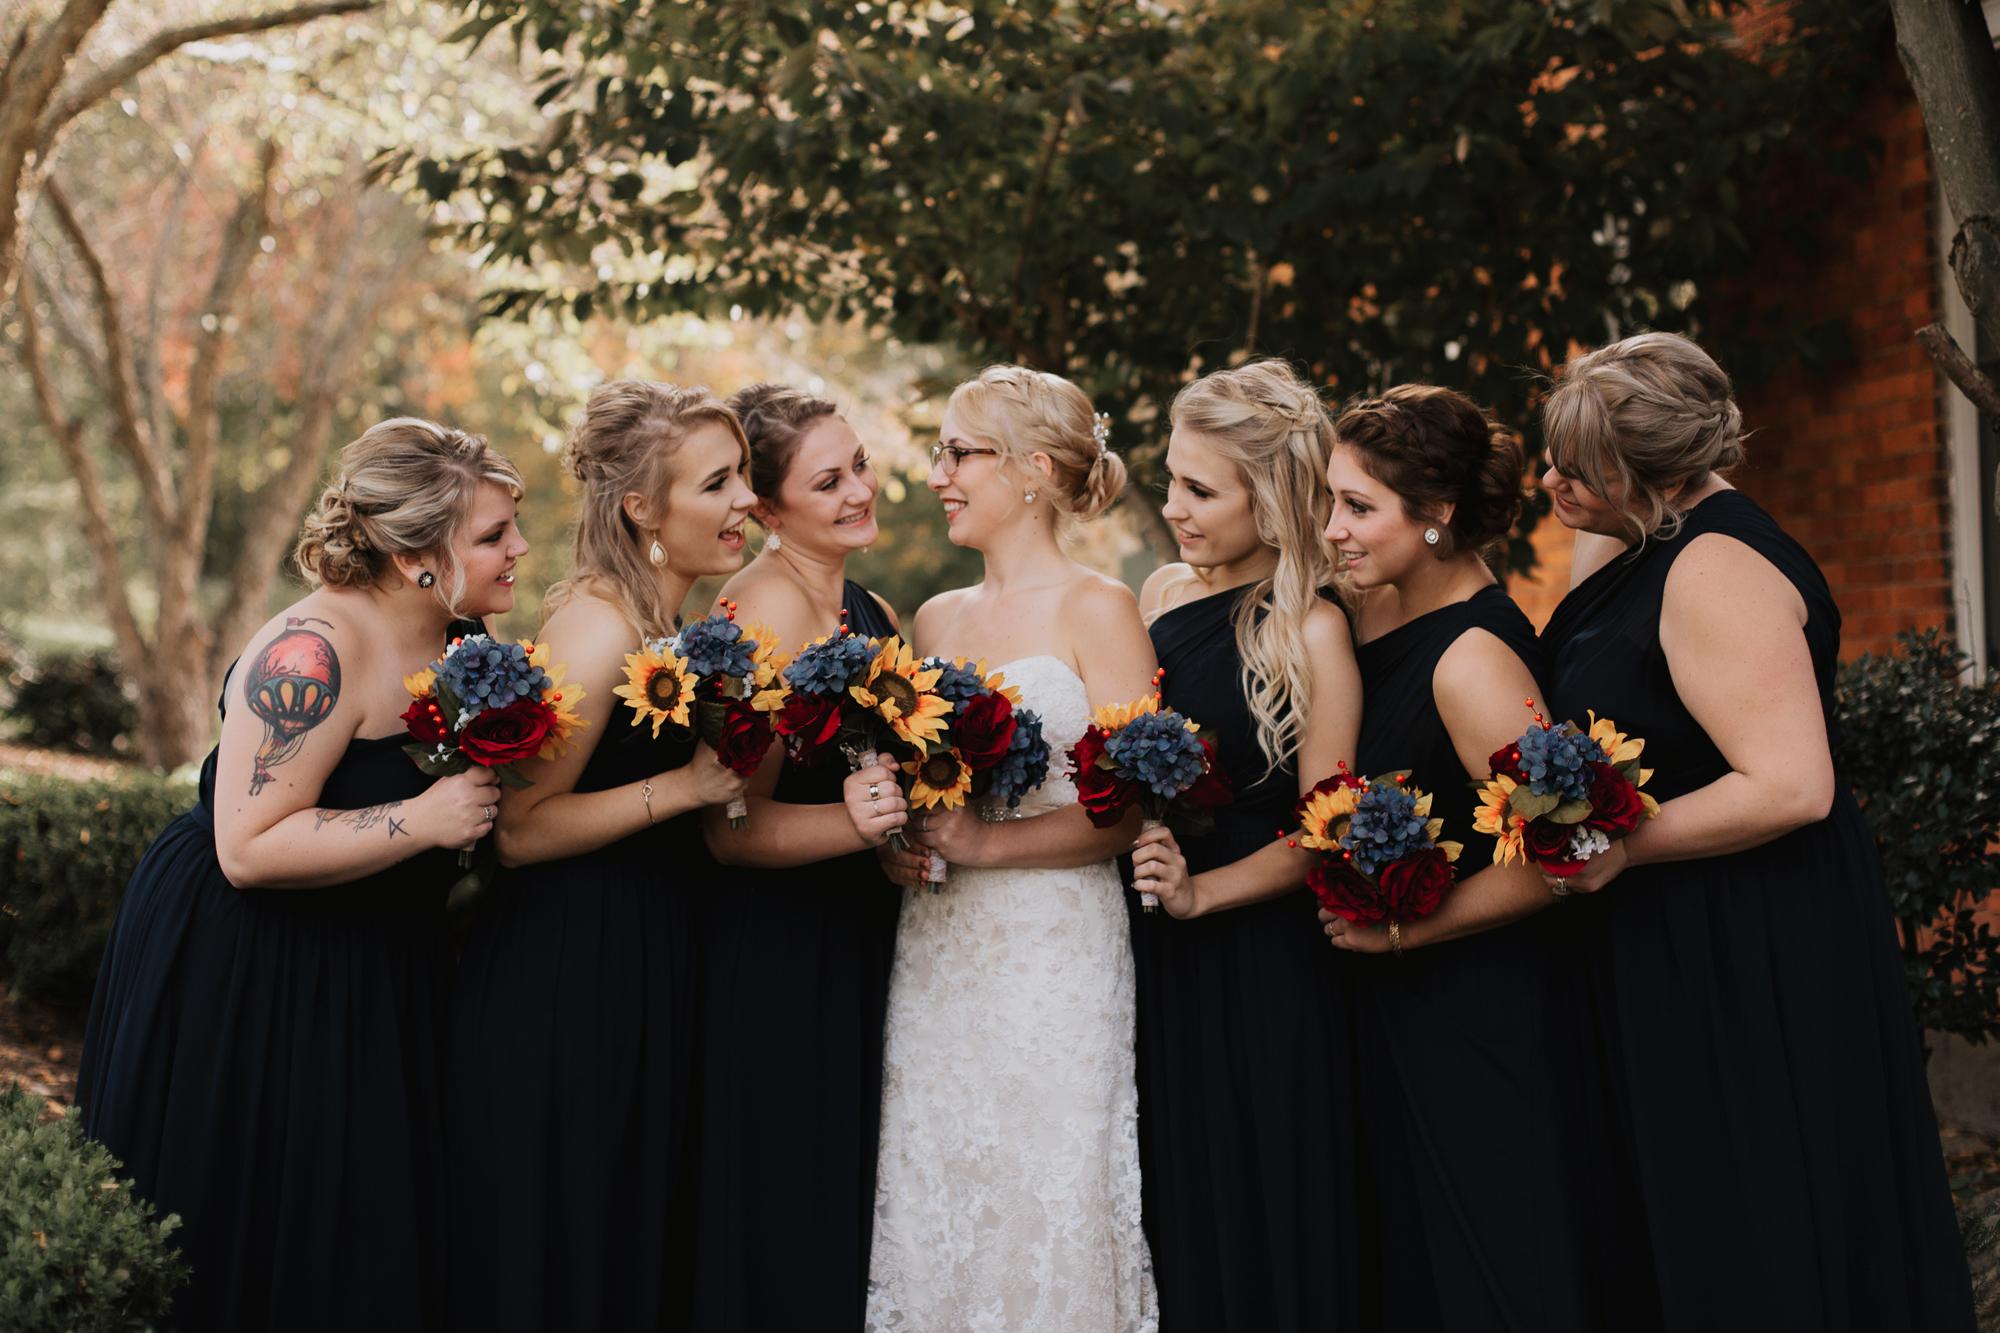 bride-and-brides-maids-wedding-day-photography-at-the-farm-at-beeber-drive-muncy-pa